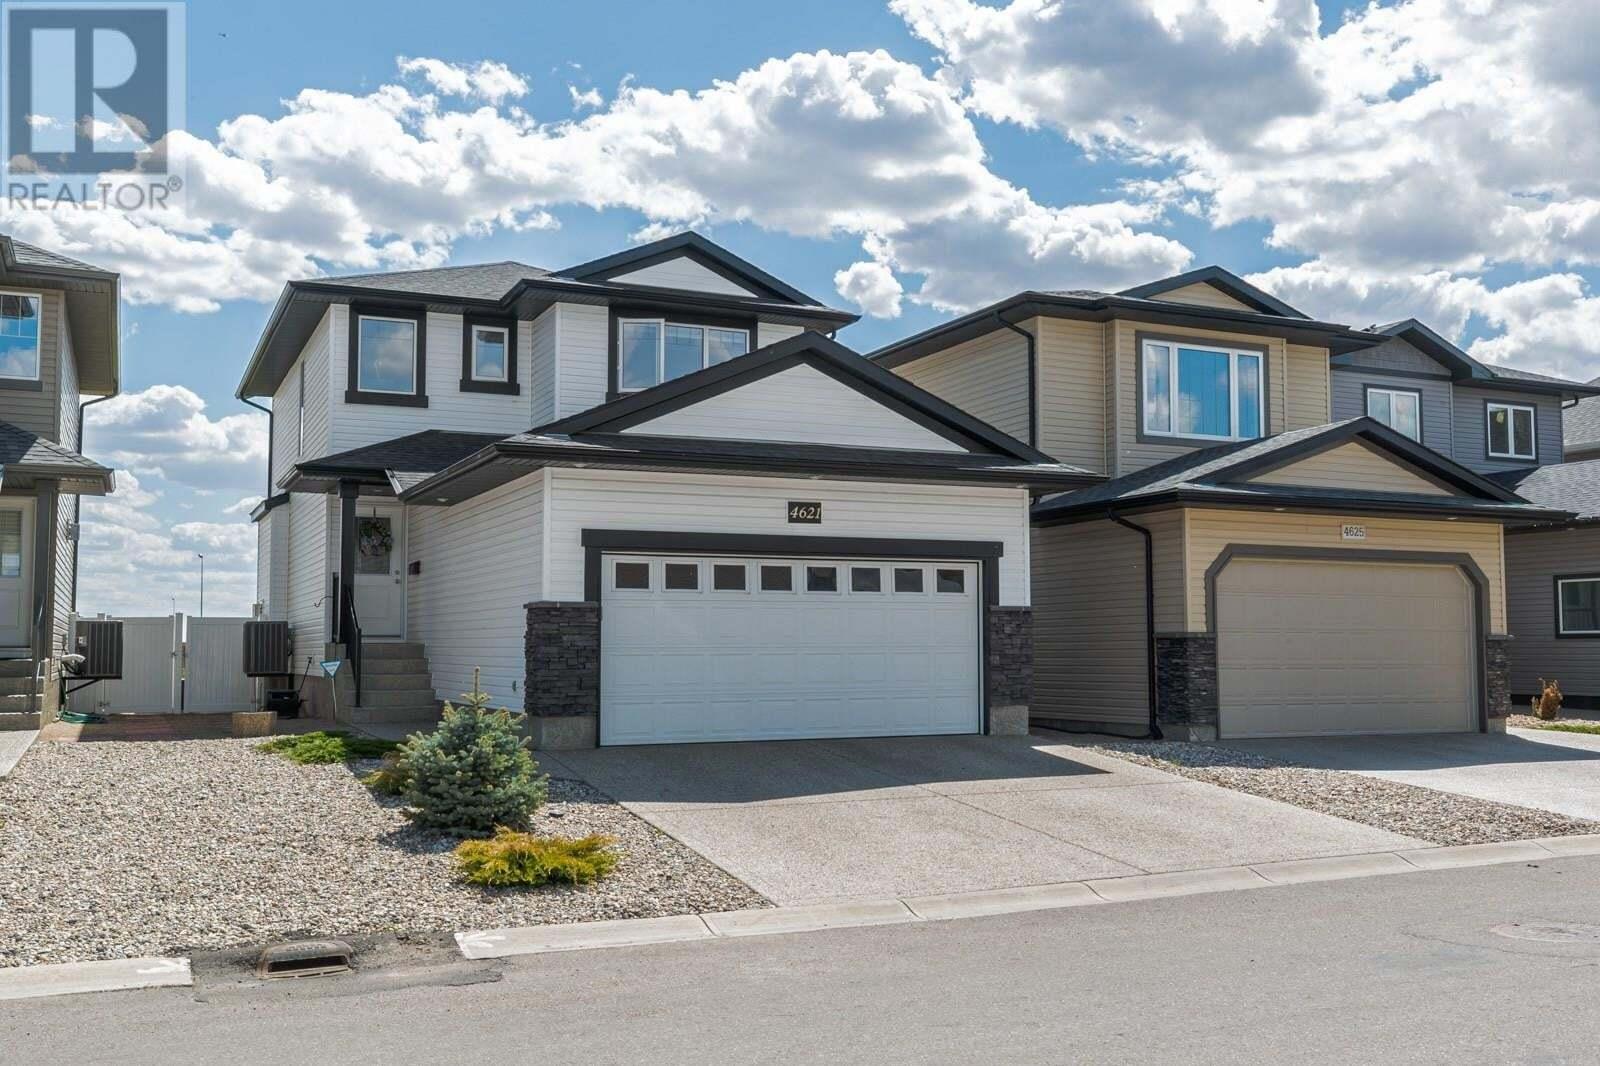 House for sale at 4621 Padwick Ave Regina Saskatchewan - MLS: SK809837